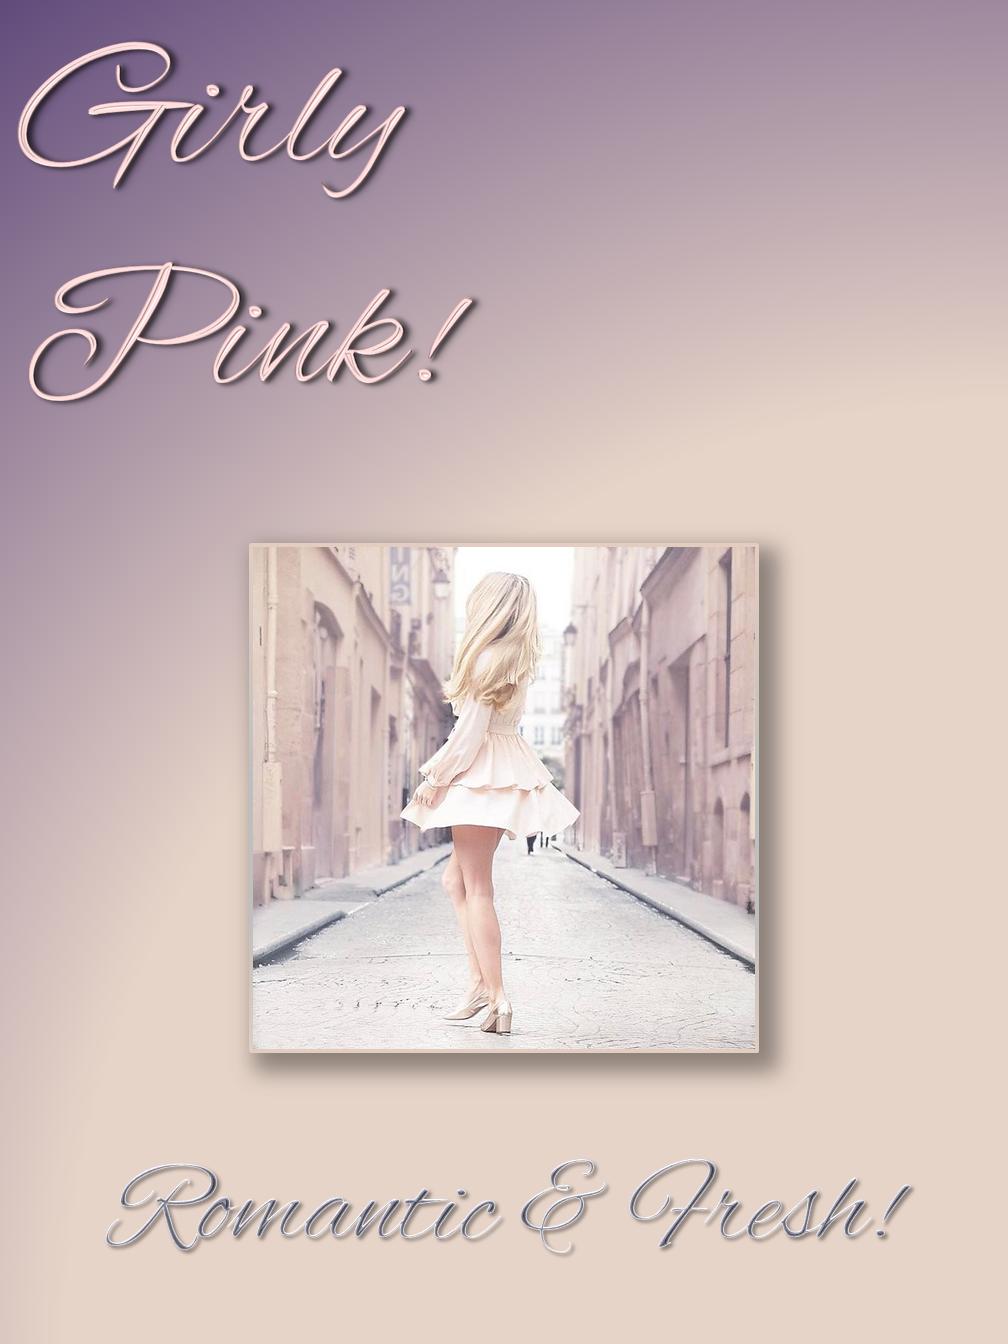 Girly Pink!